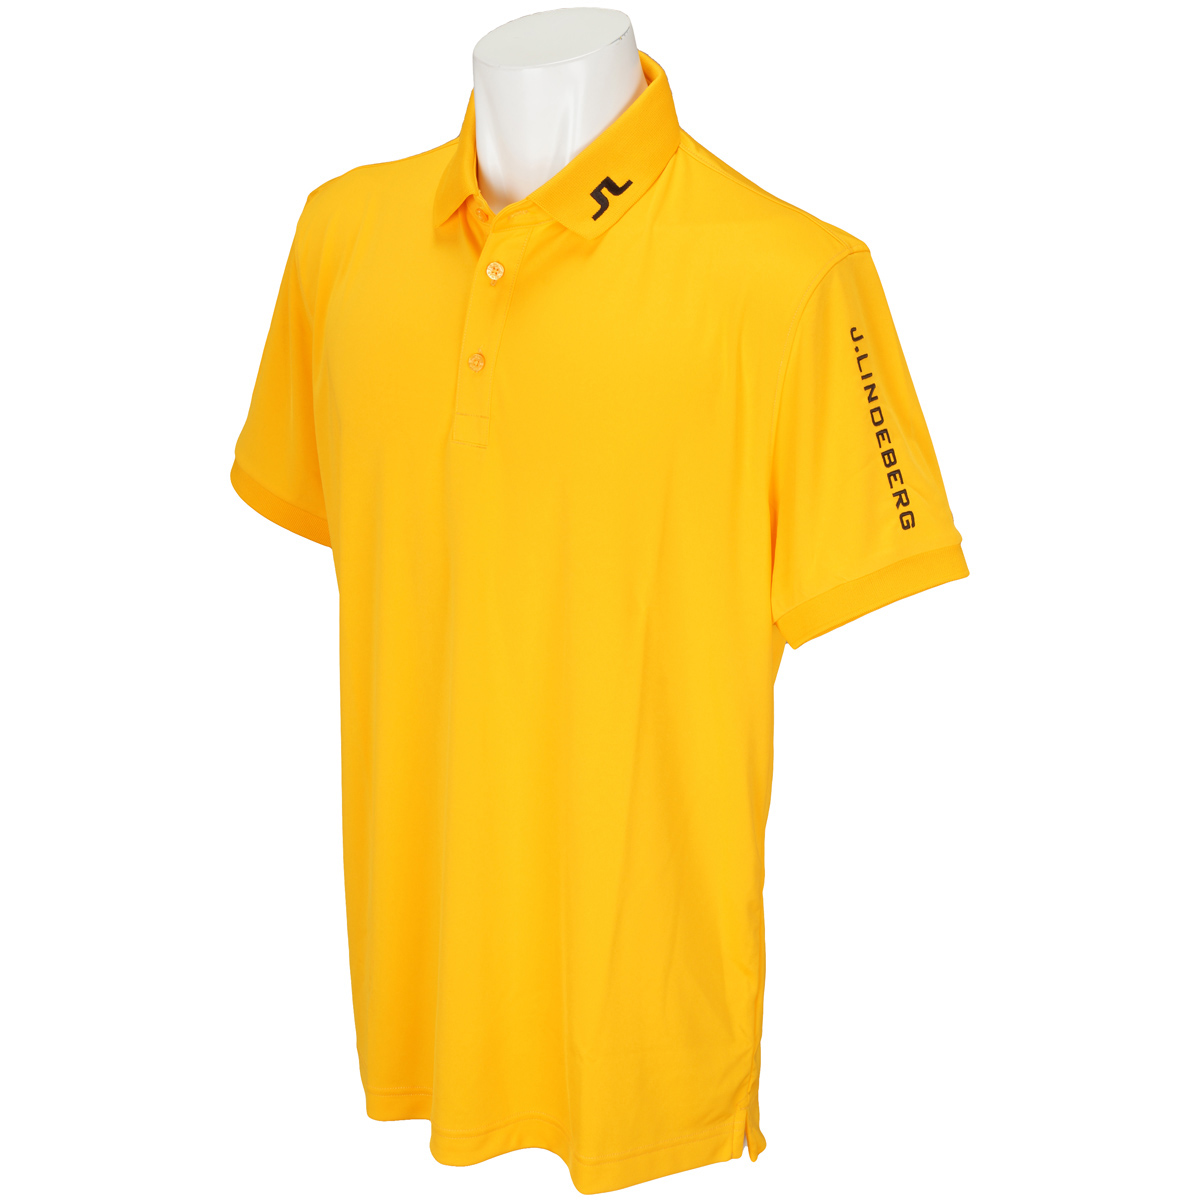 M44B TOUR TECH スリム プリント 半袖ポロシャツ